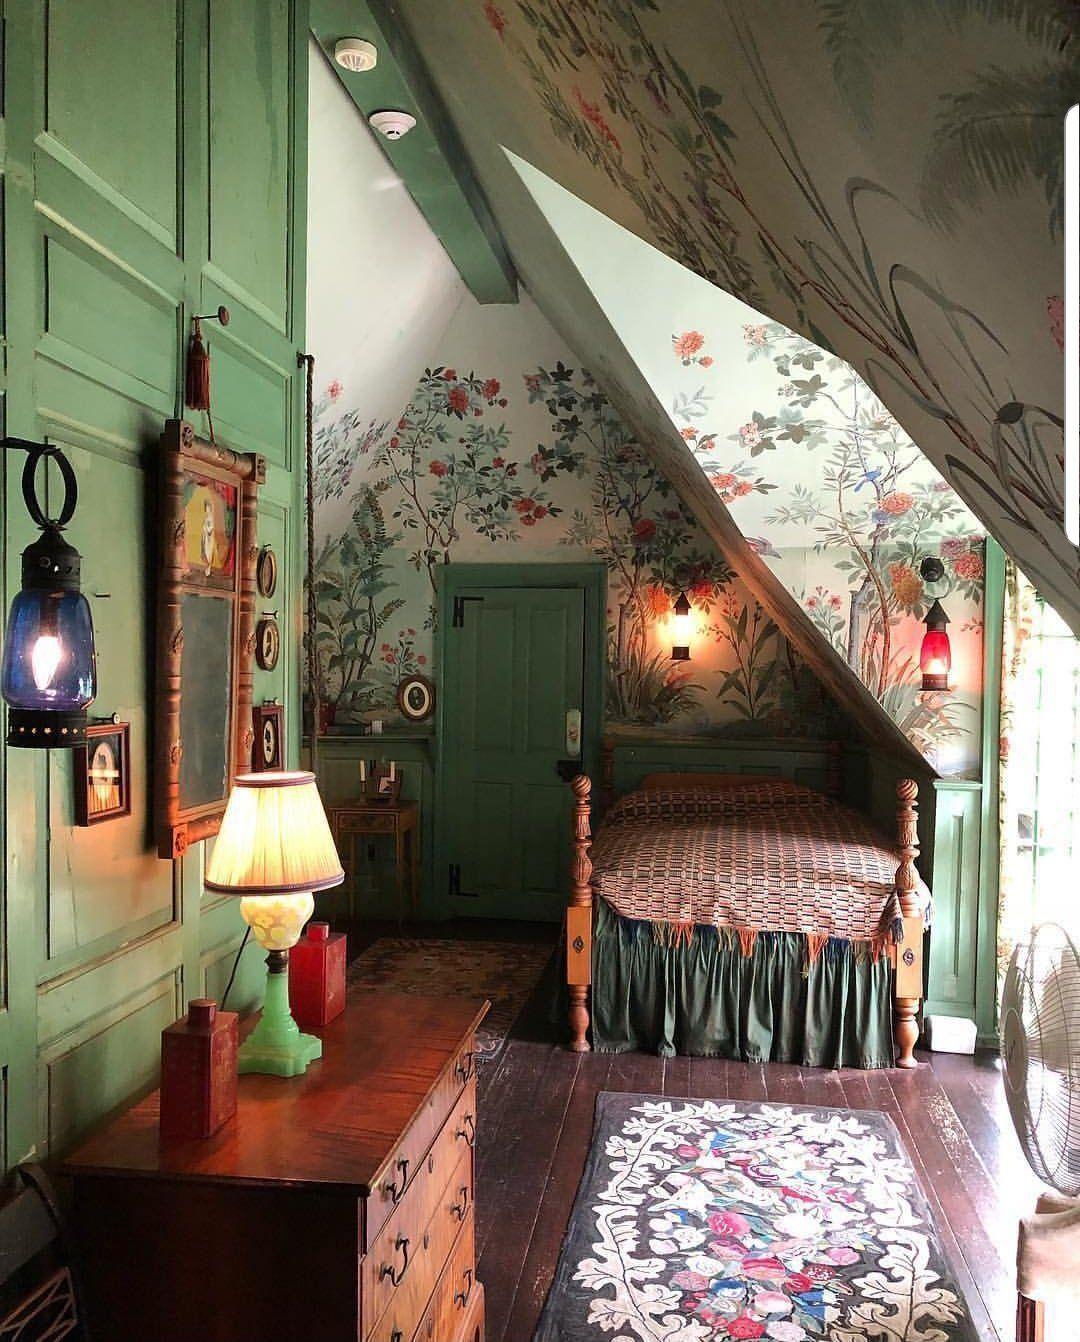 I love this cozy attic bedroom.